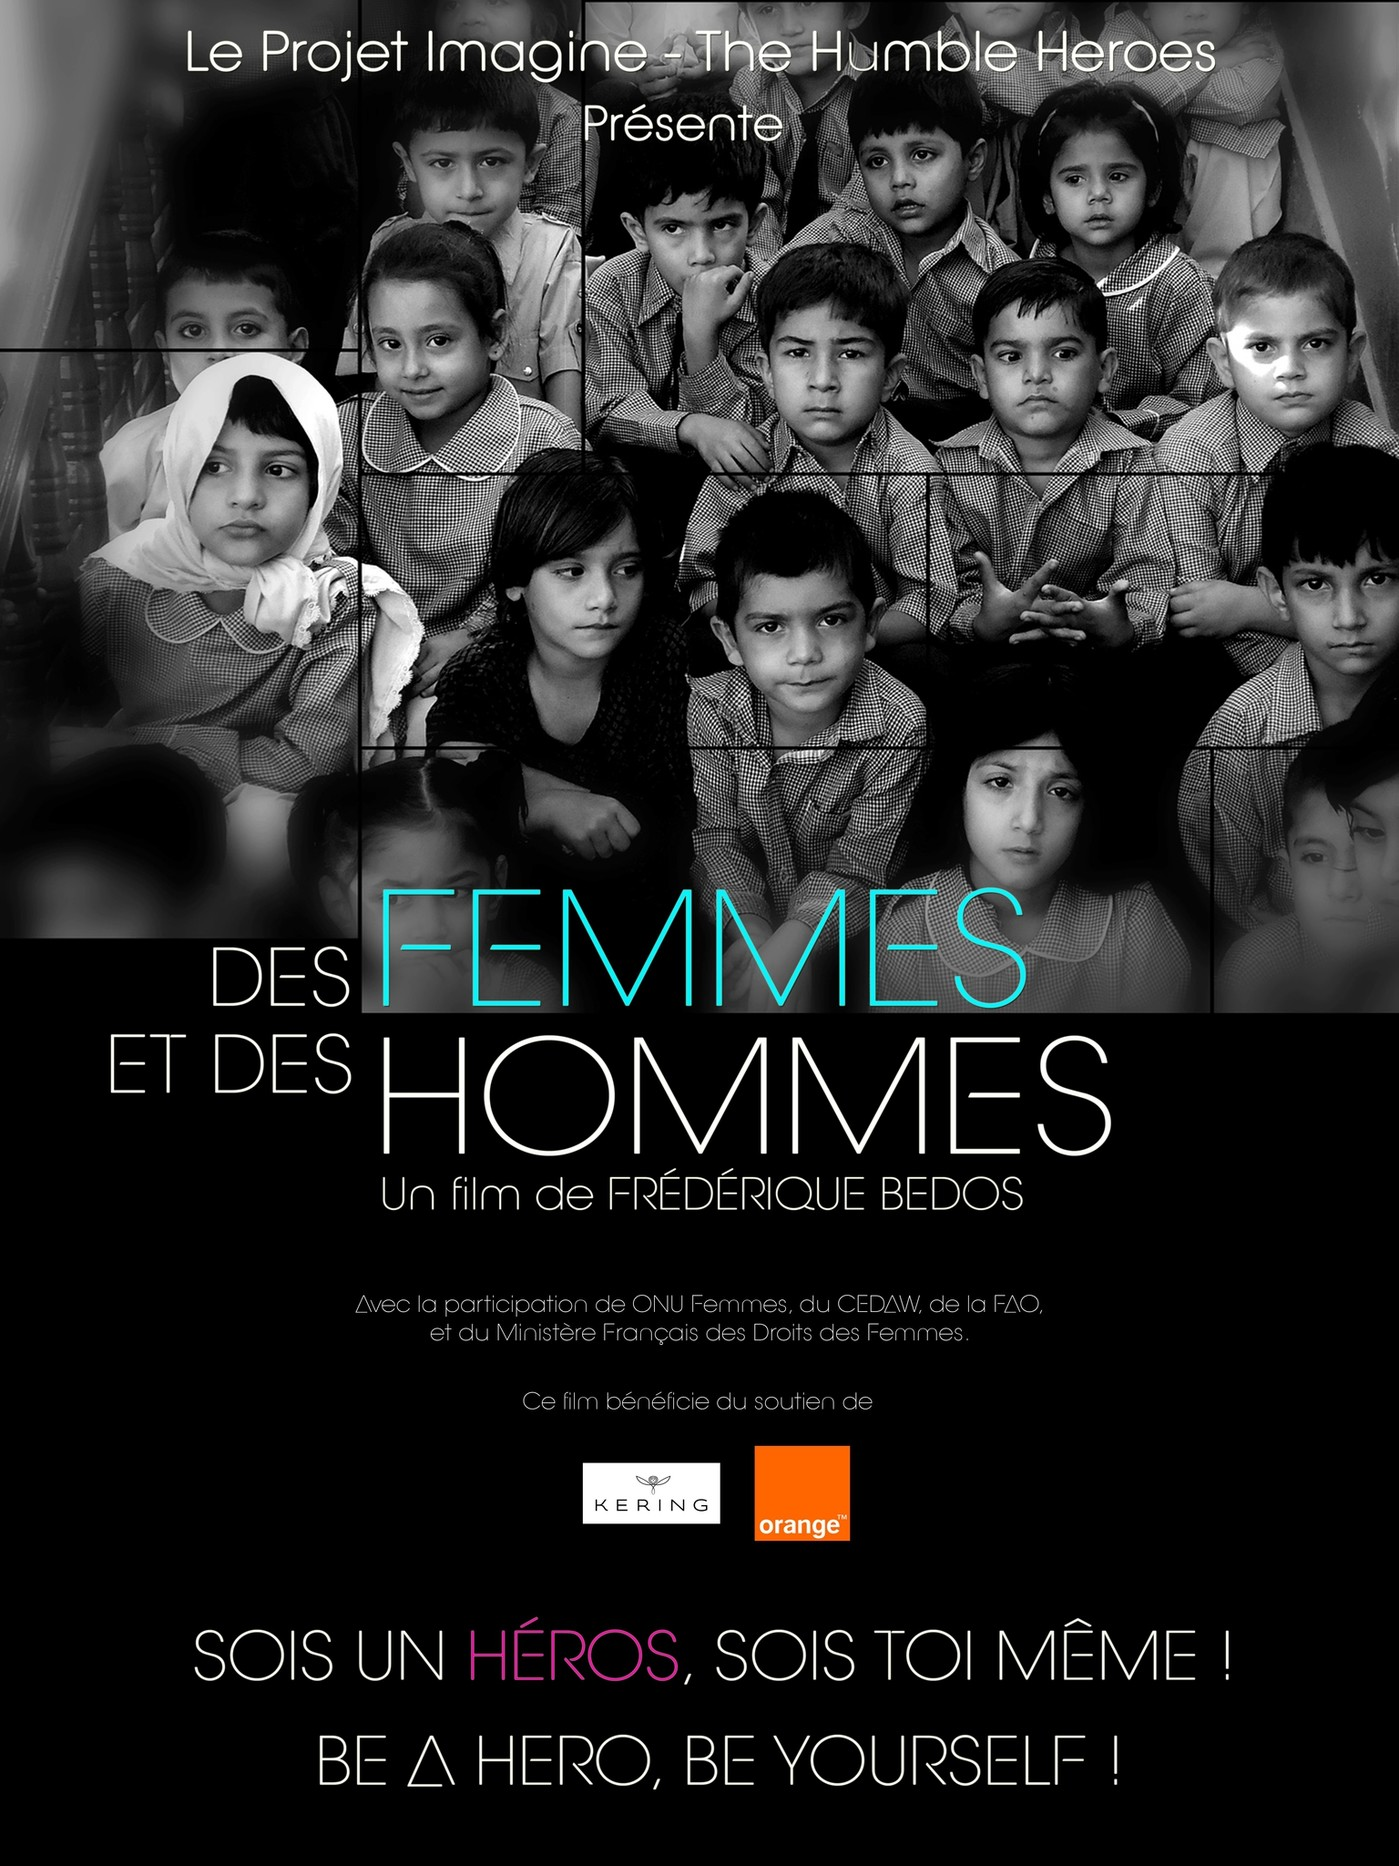 Des femmes et des hommes (115 min)